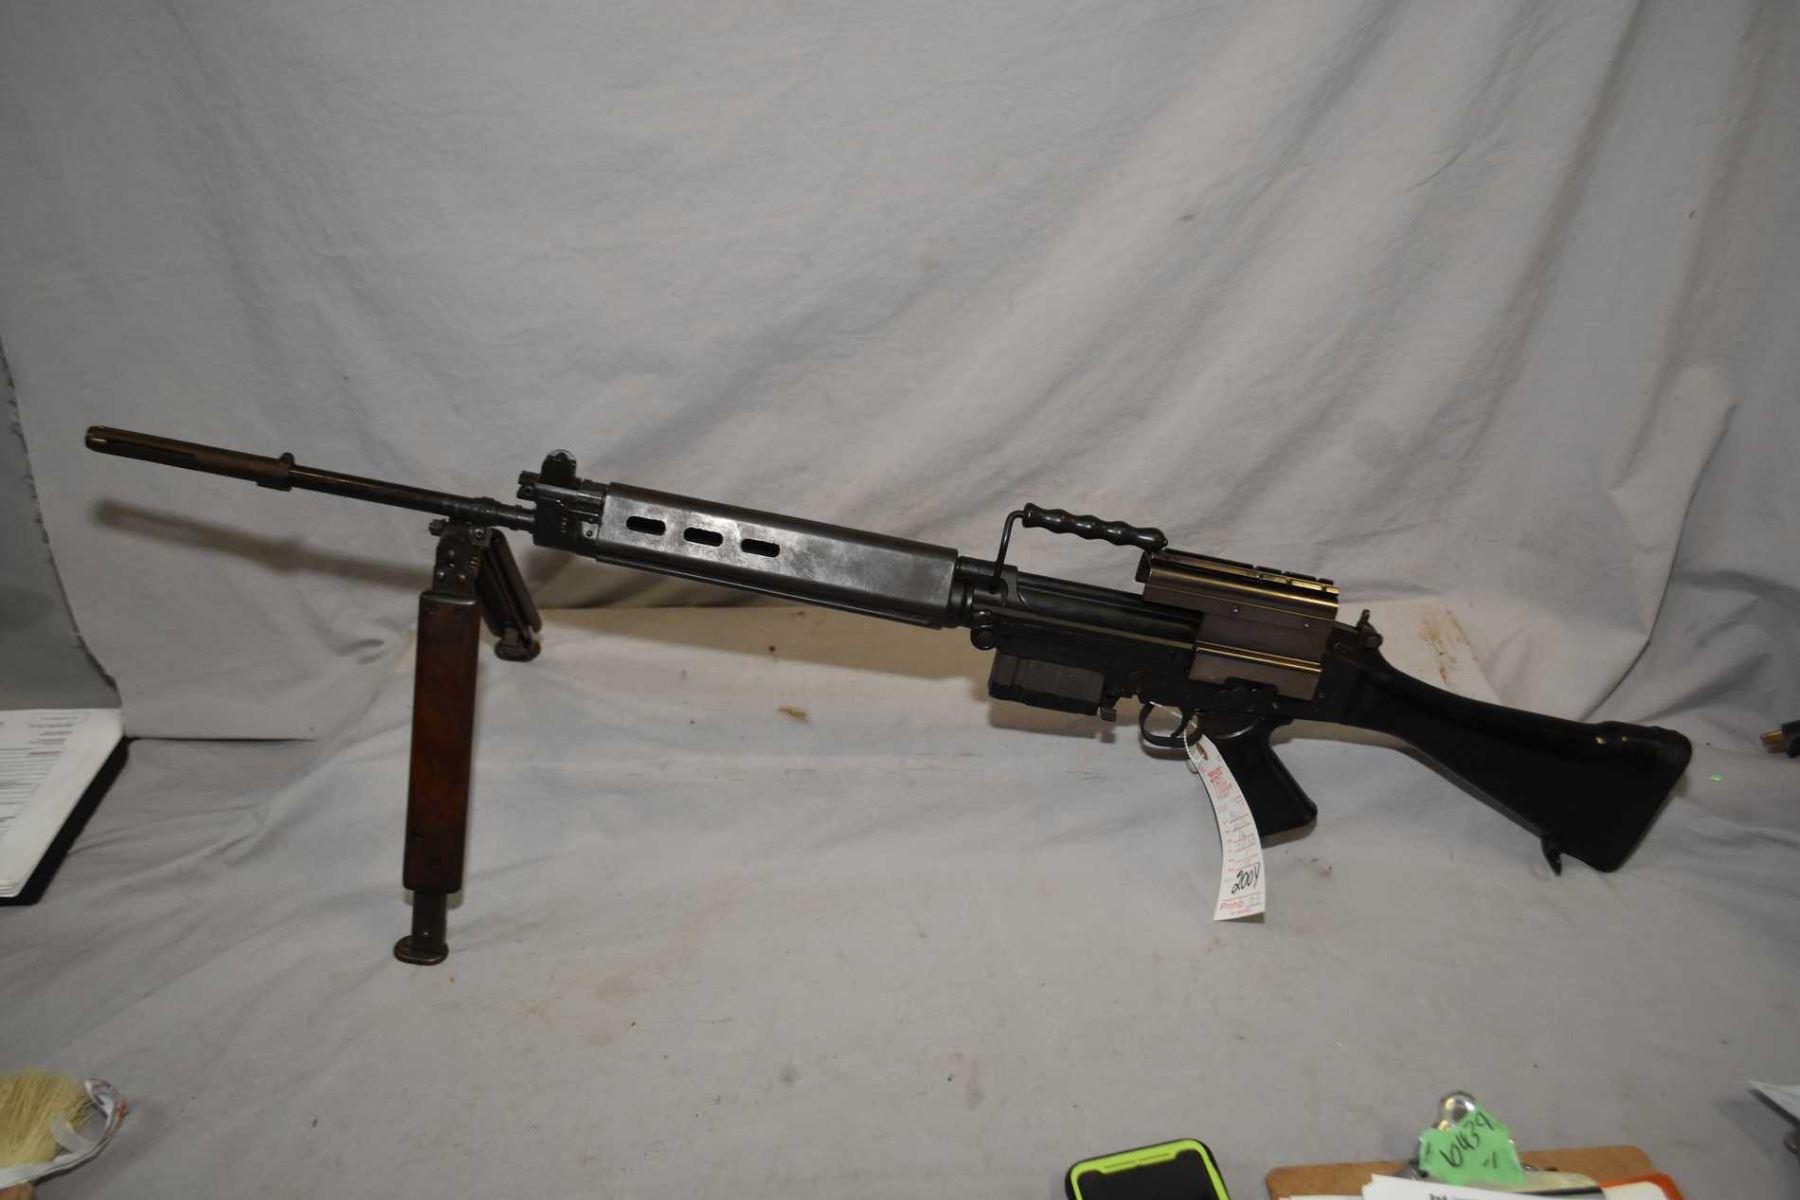 Prohib 12 - 5 - F N  FAL Model FAL 7 62 MM Nato Cal 5 Shot